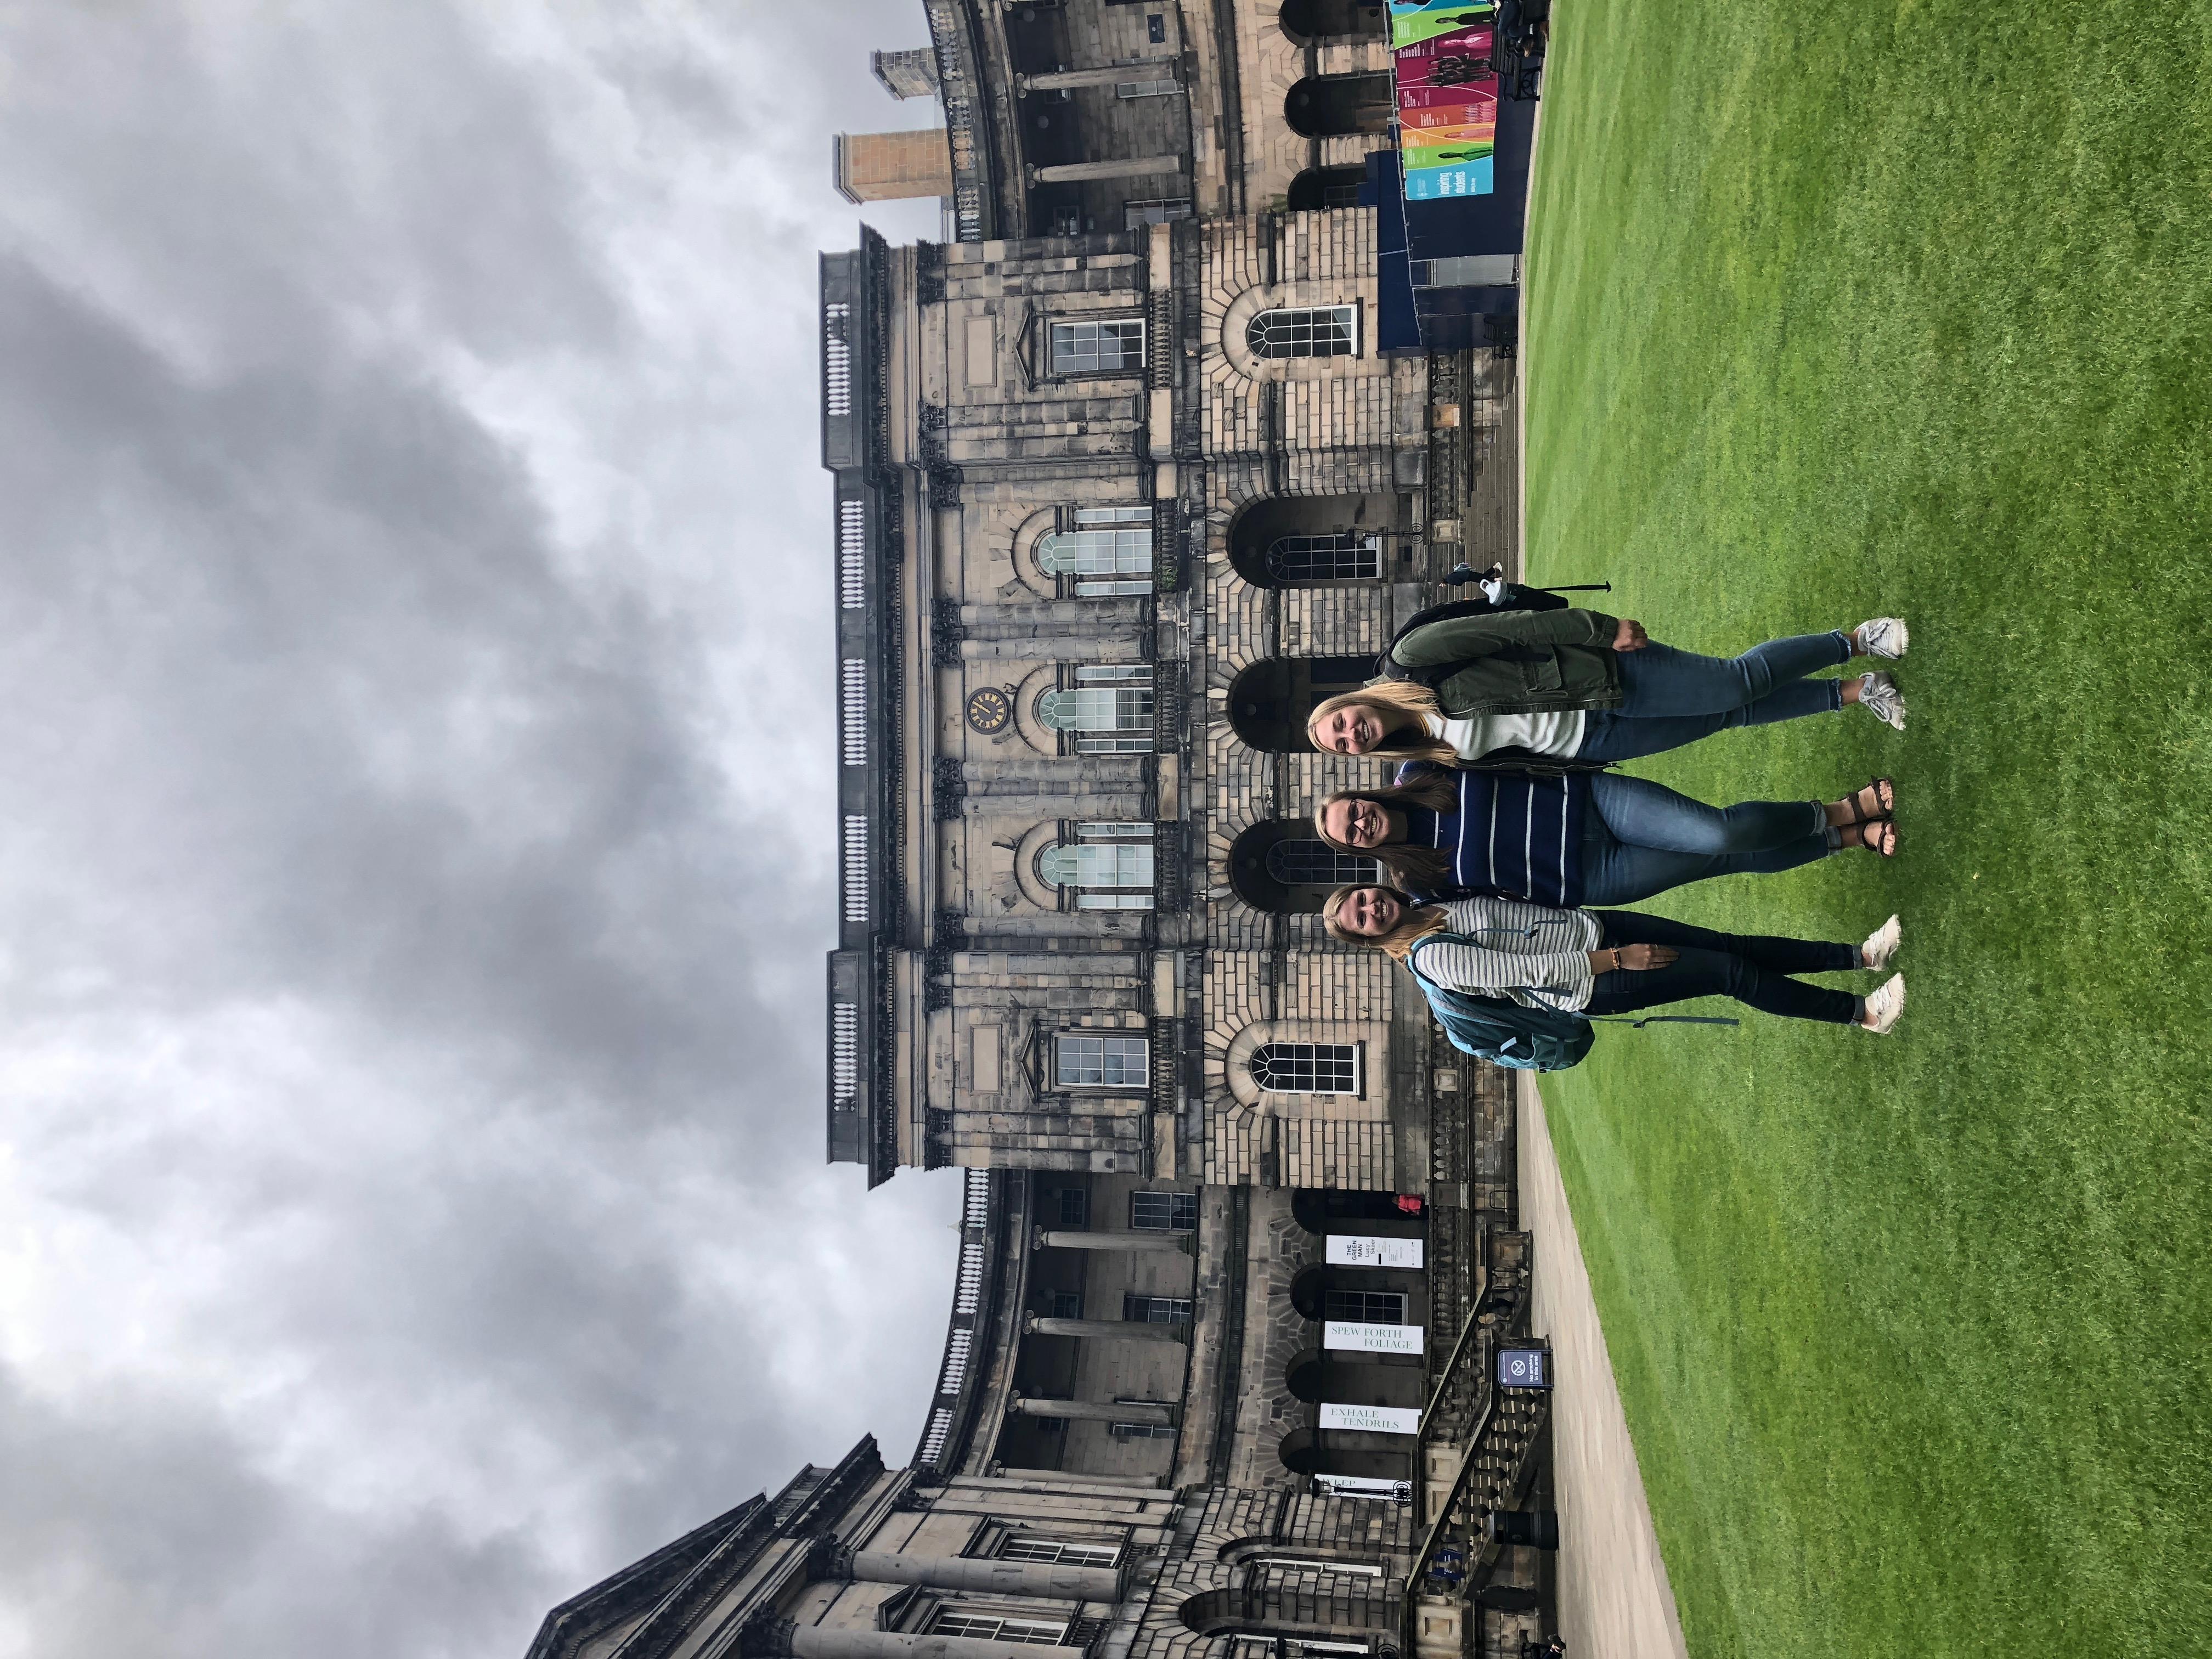 Riley at Old College in Edinburgh